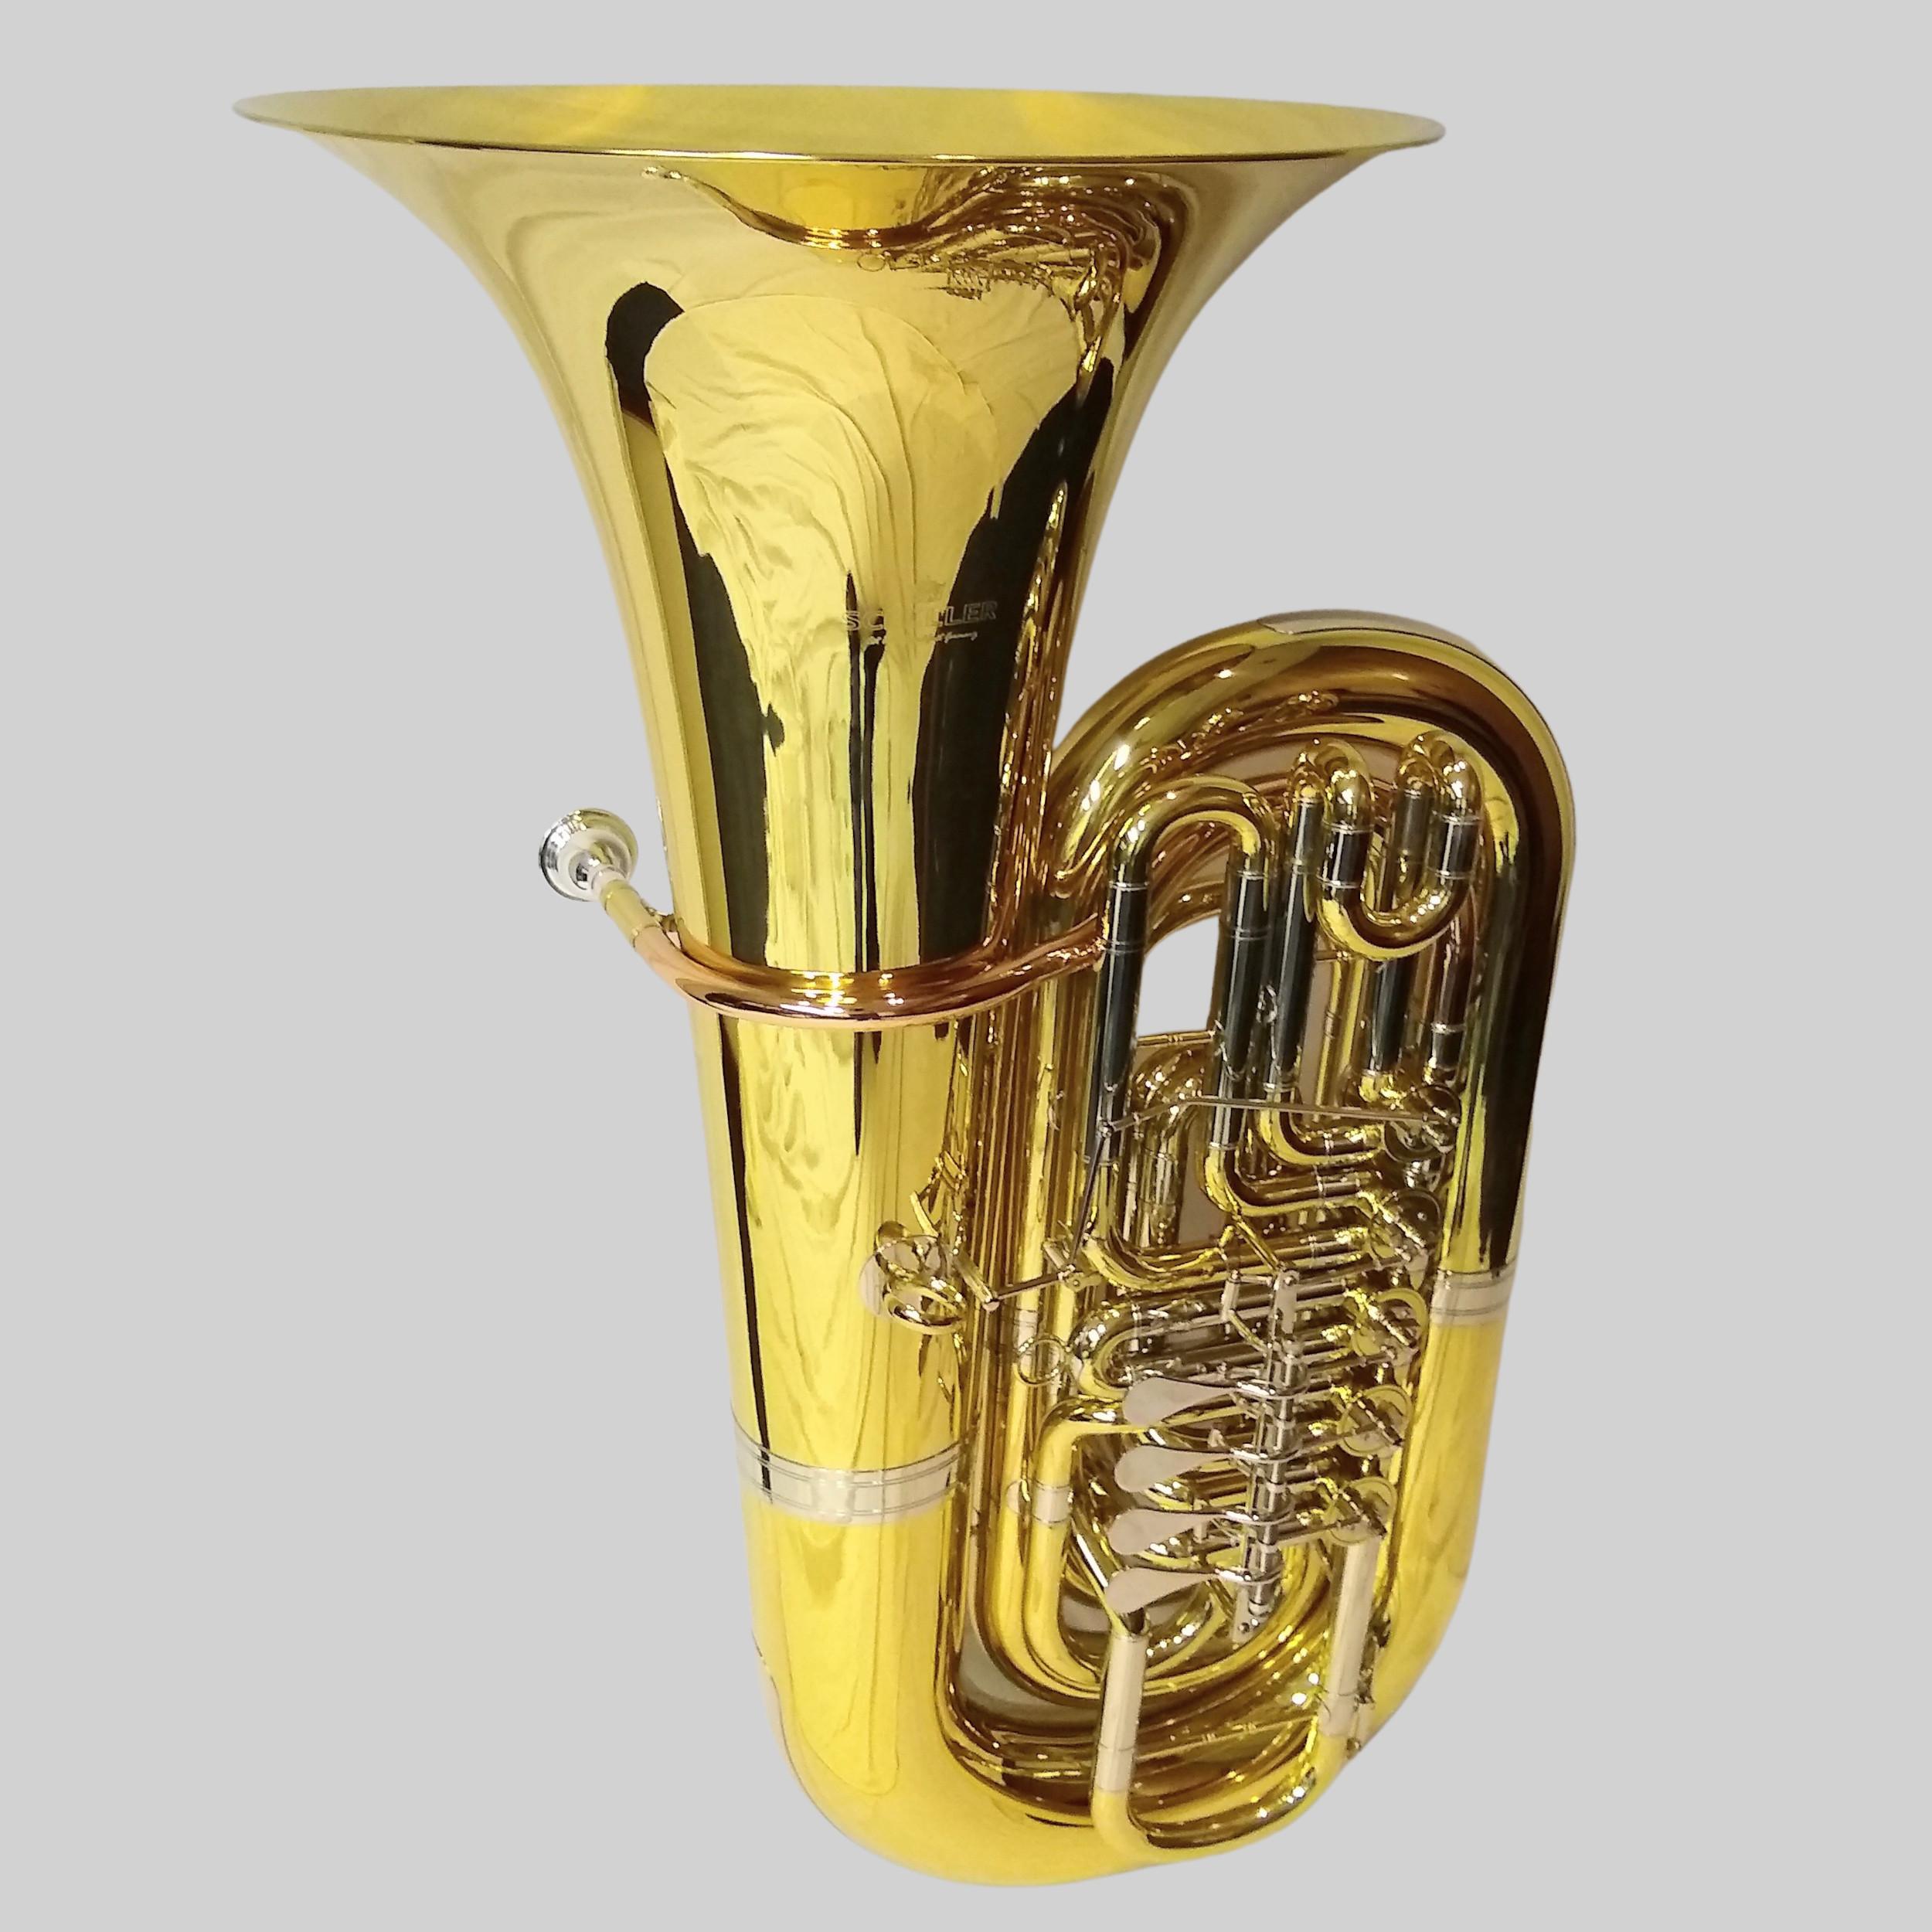 Schiller American Heritage 5 Valve Rotary Tuba C-Bb-A